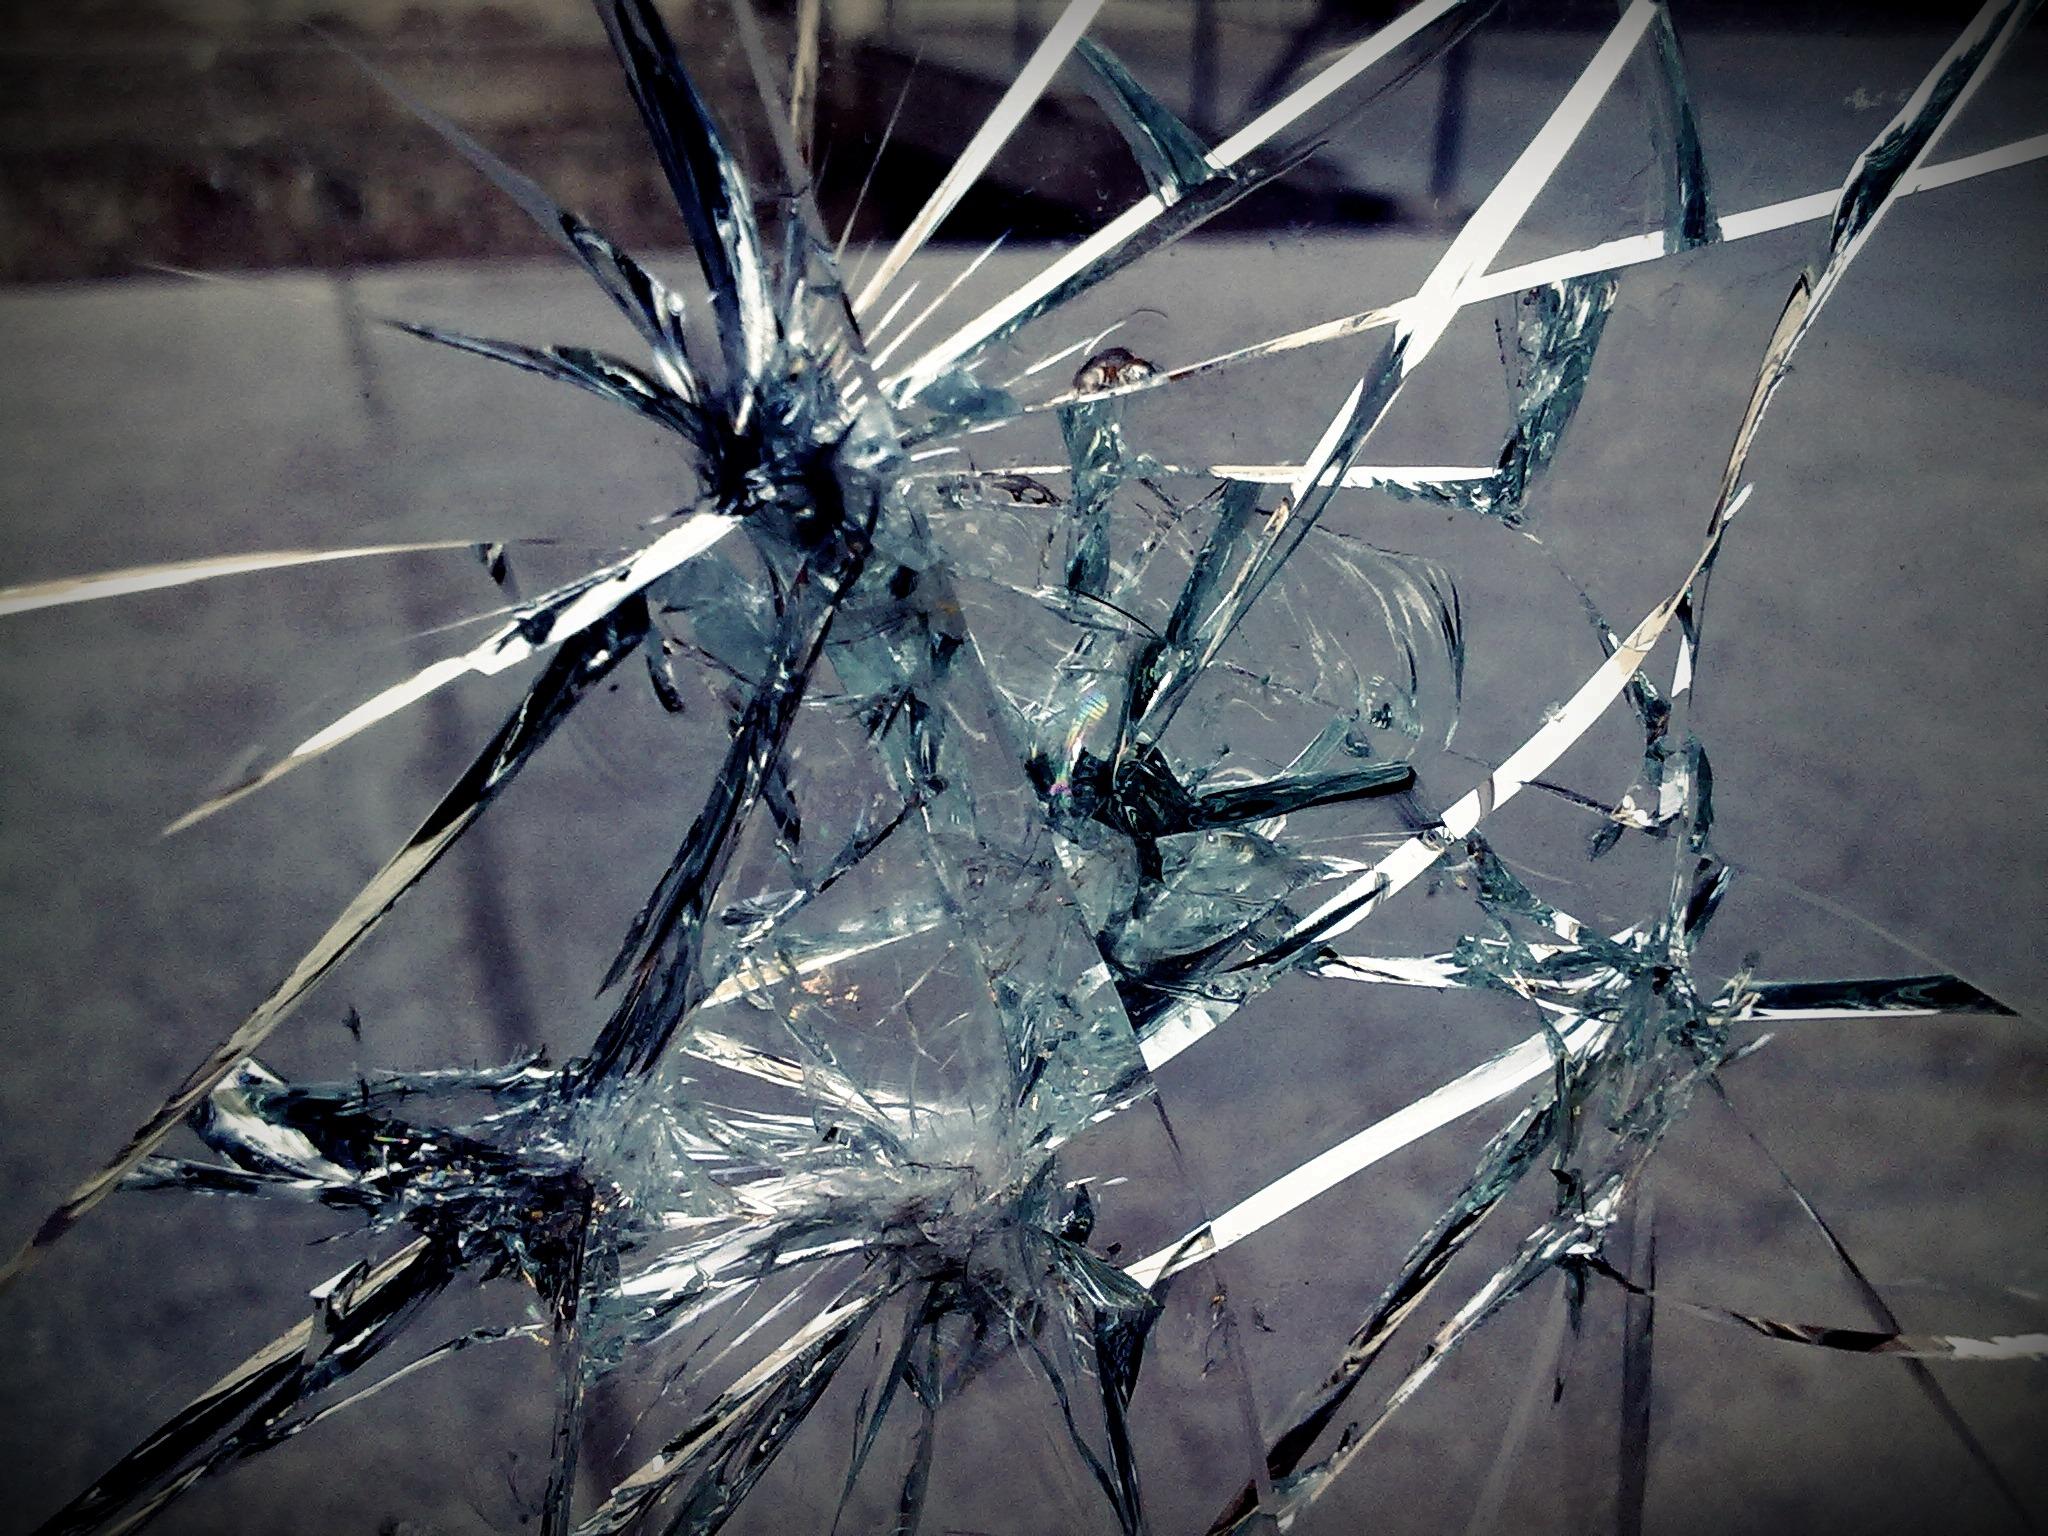 branch winter light photography texture glass ice reflection broken close up break broken glass cracks dangerous macro photography thorns spines and prickles piedrazo 1142681